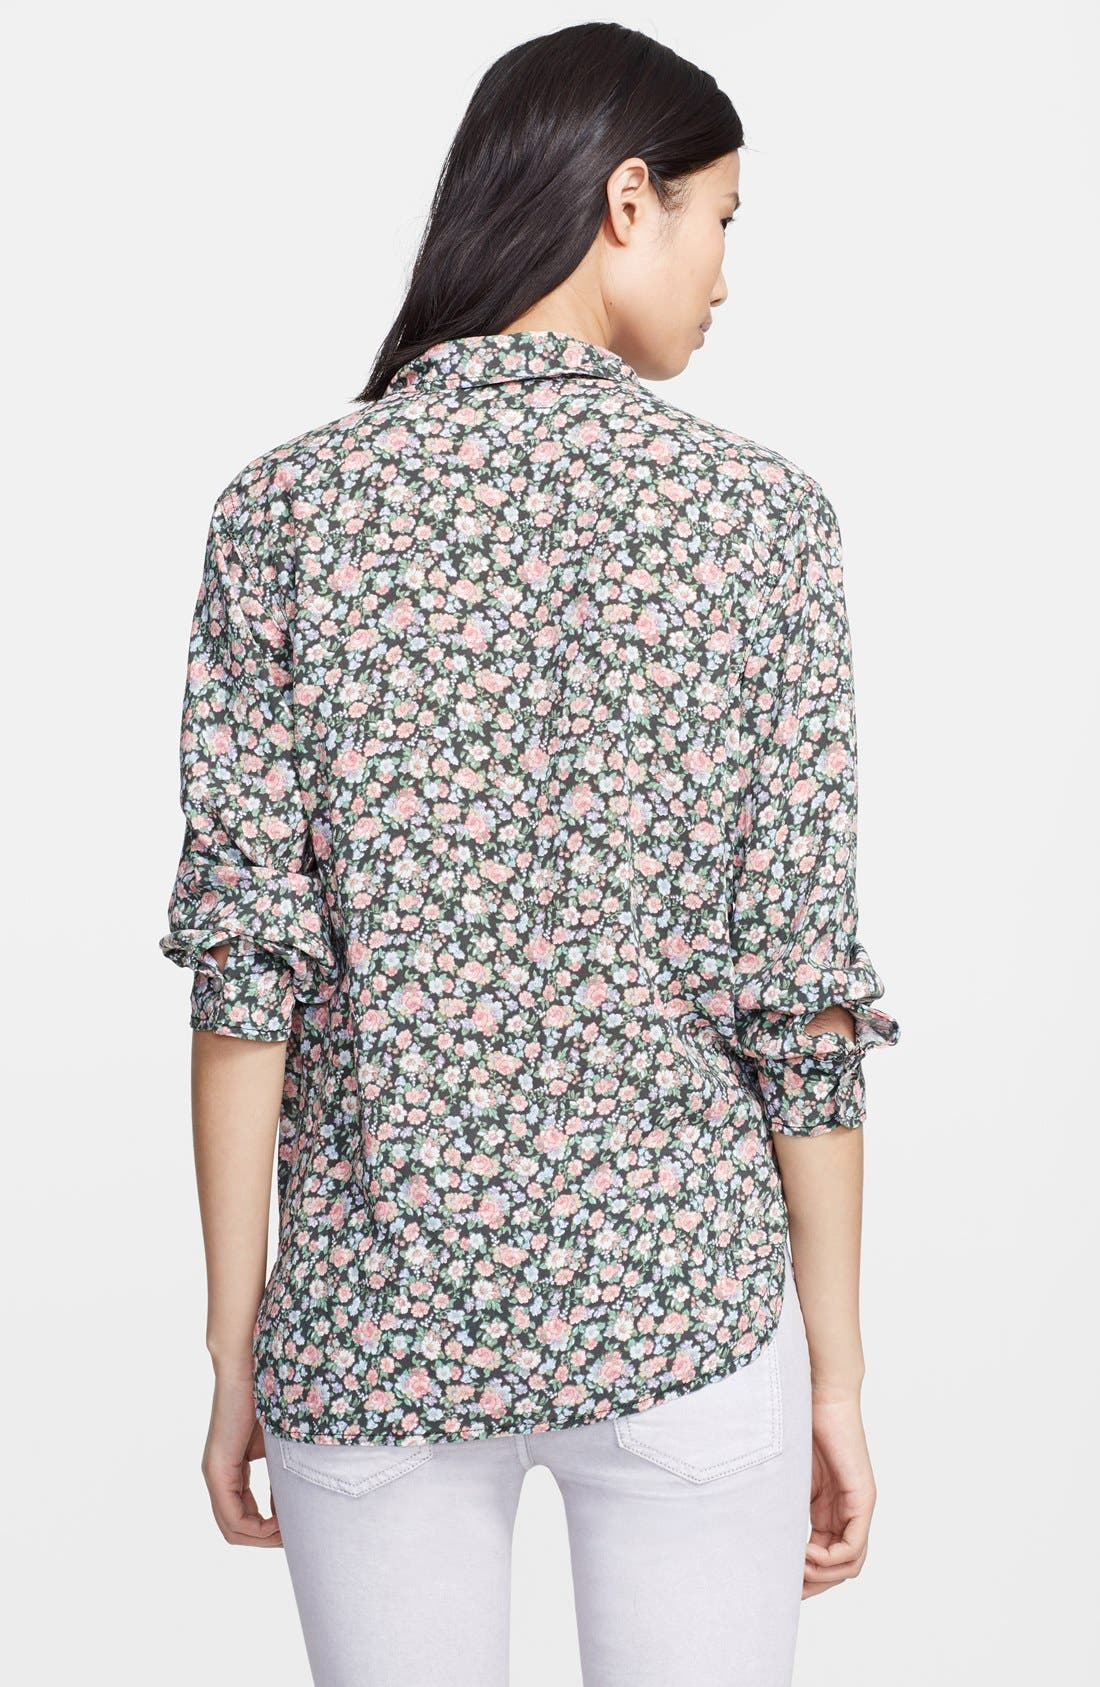 Alternate Image 2  - Current/Elliott 'The Perfect Shirt' Floral Print Shirt